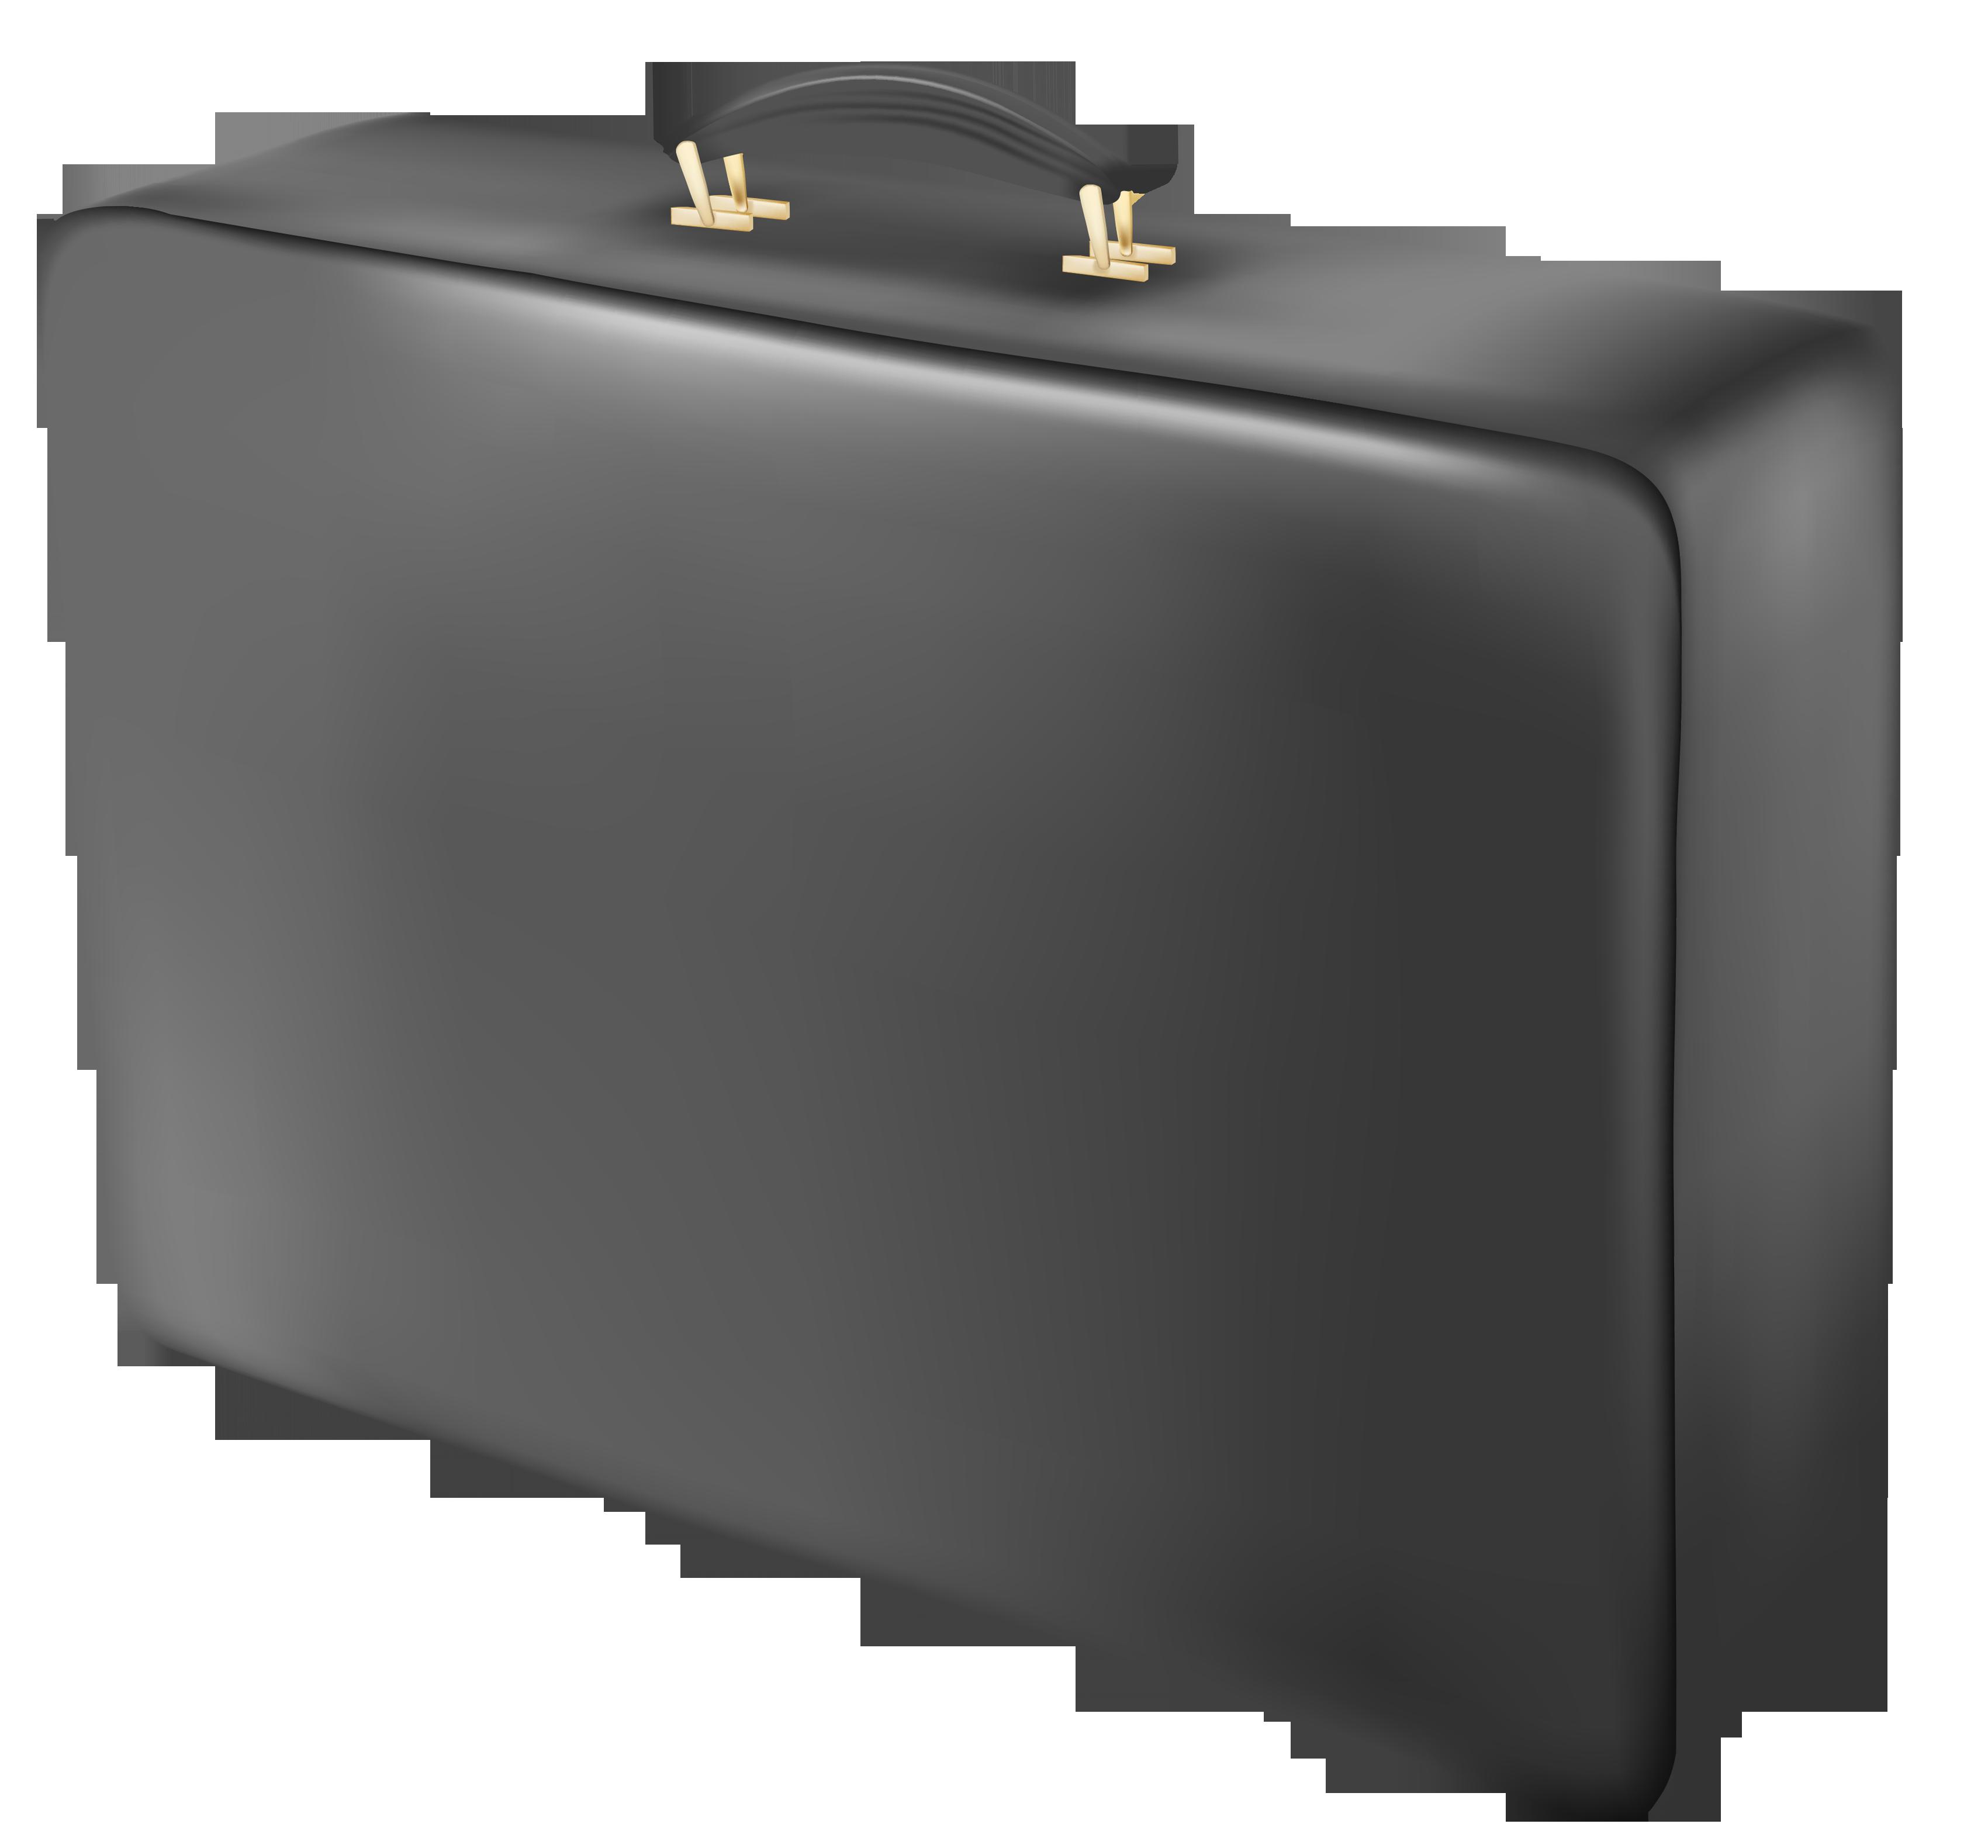 Suitcase PNG image - Suitcase HD PNG - Suit HD PNG